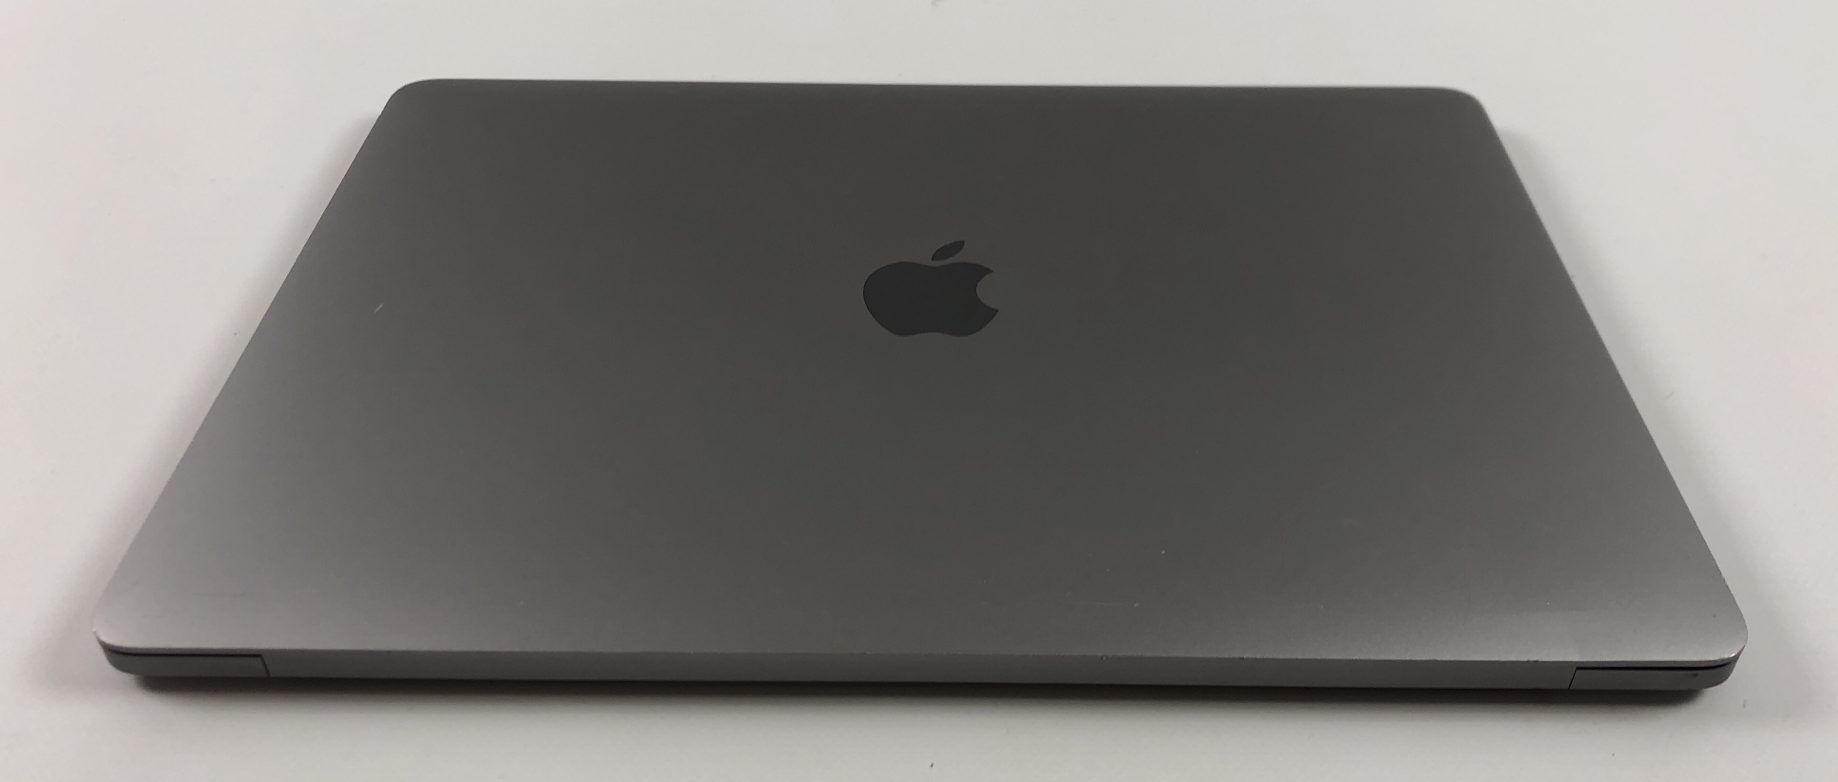 "MacBook Pro 13"" 4TBT Late 2016 (Intel Core i5 2.9 GHz 8 GB RAM 512 GB SSD), Space Gray, Intel Core i5 2.9 GHz, 8 GB RAM, 512 GB SSD, image 2"